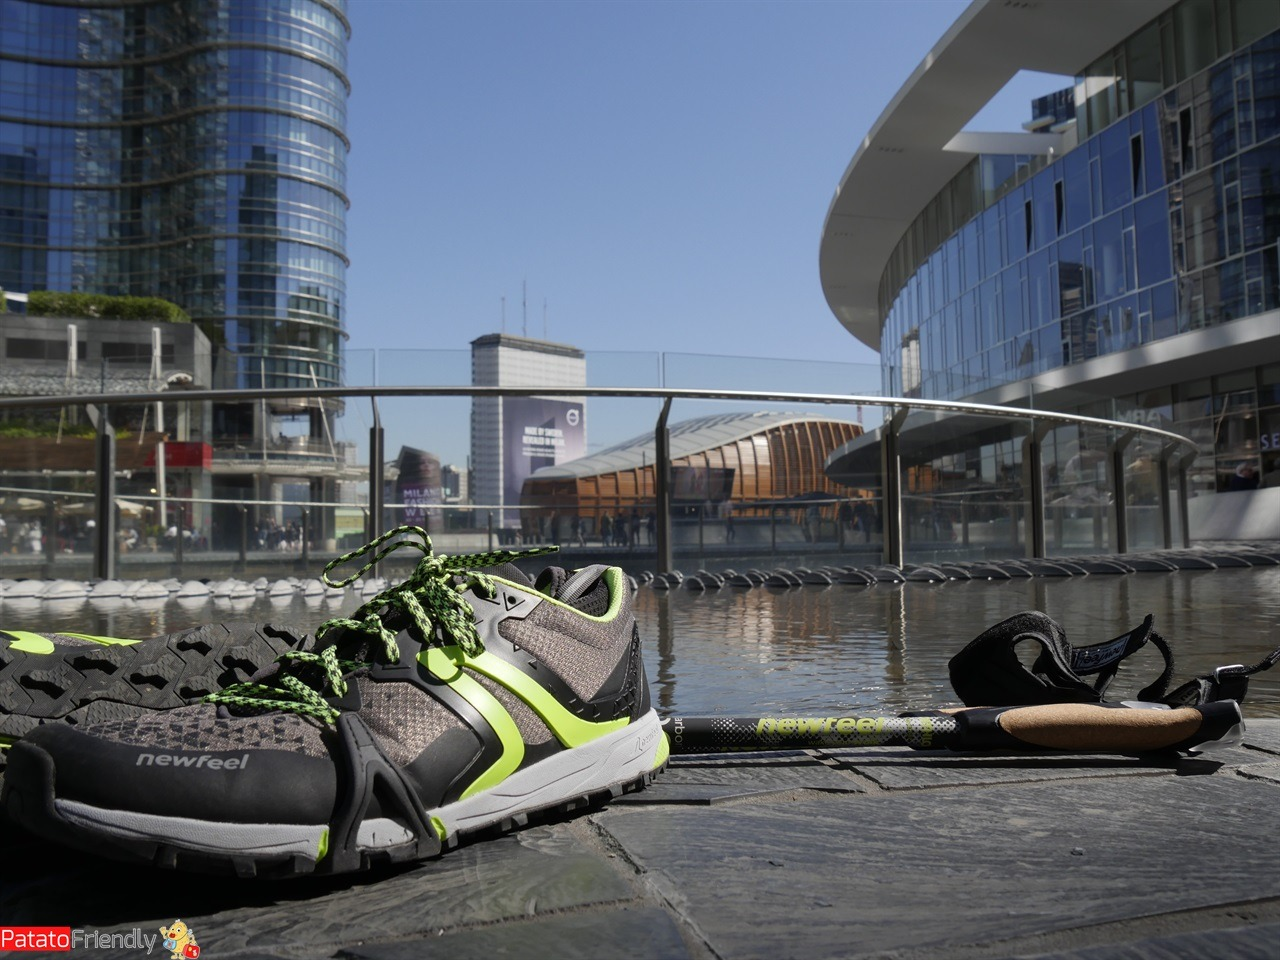 Le scarpe da Nordic Walking Newfeel di Decathlon